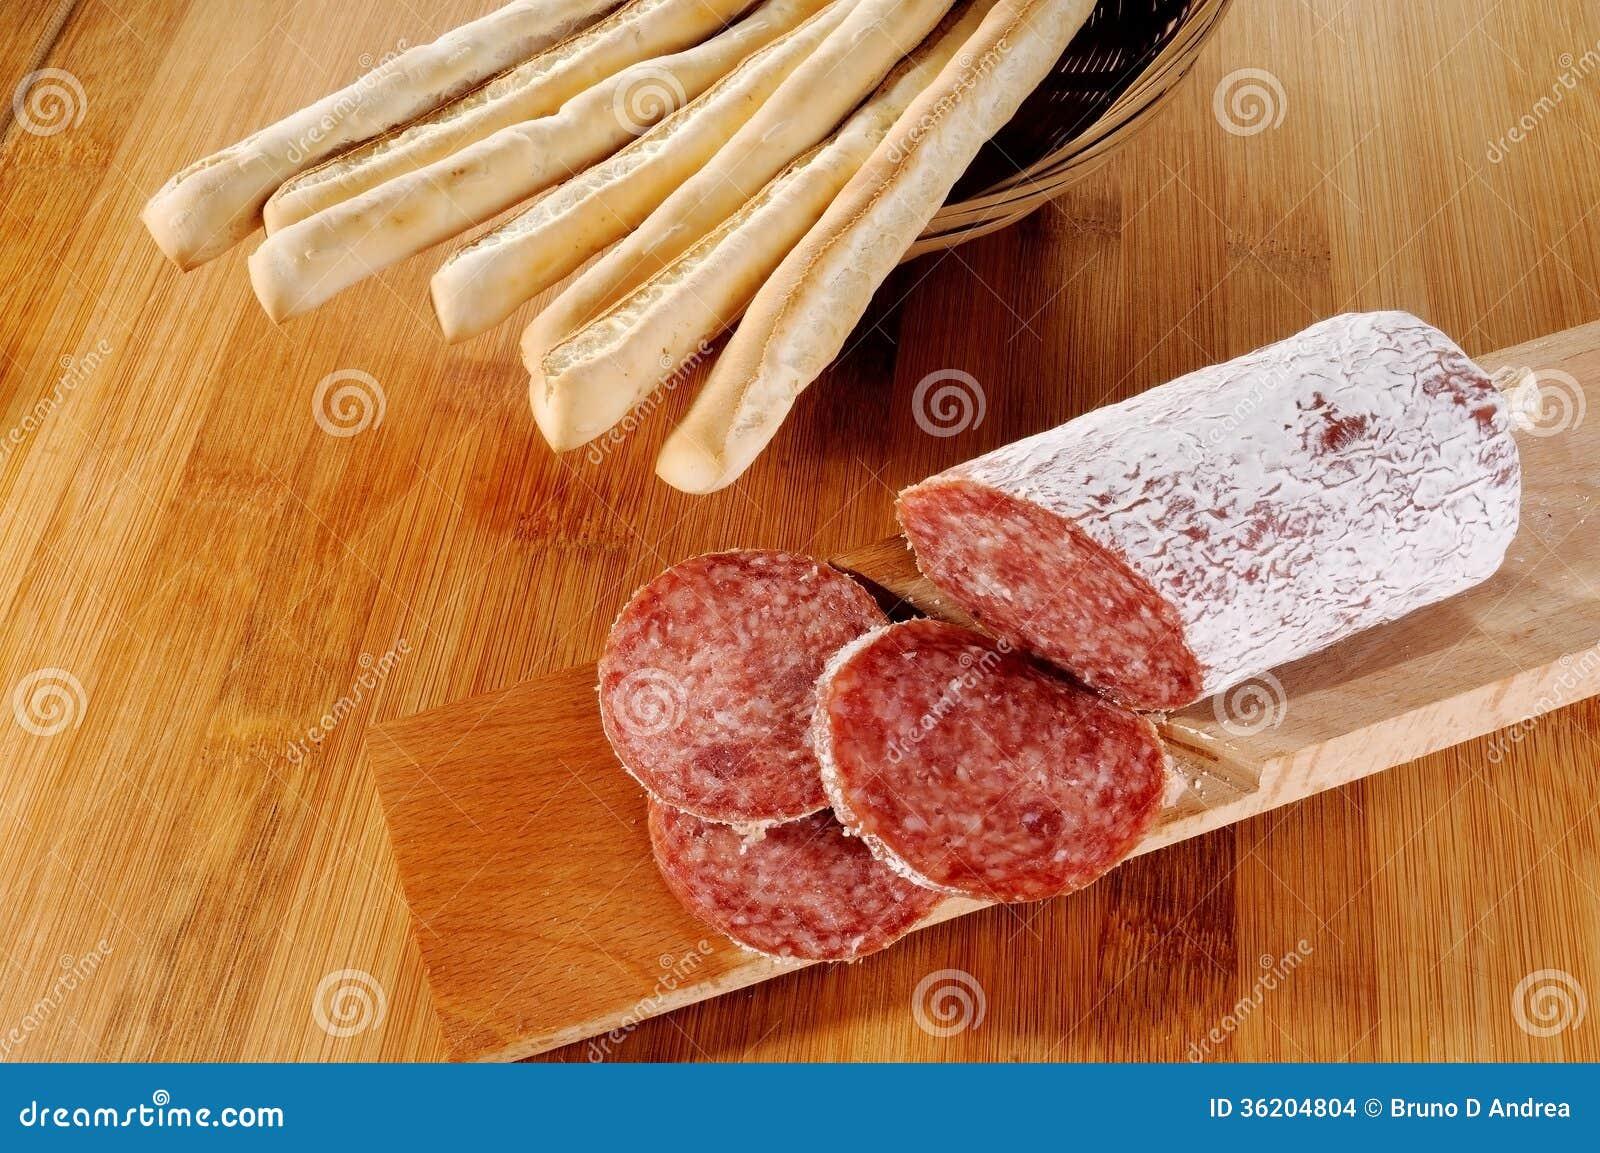 how to make italian bread sticks